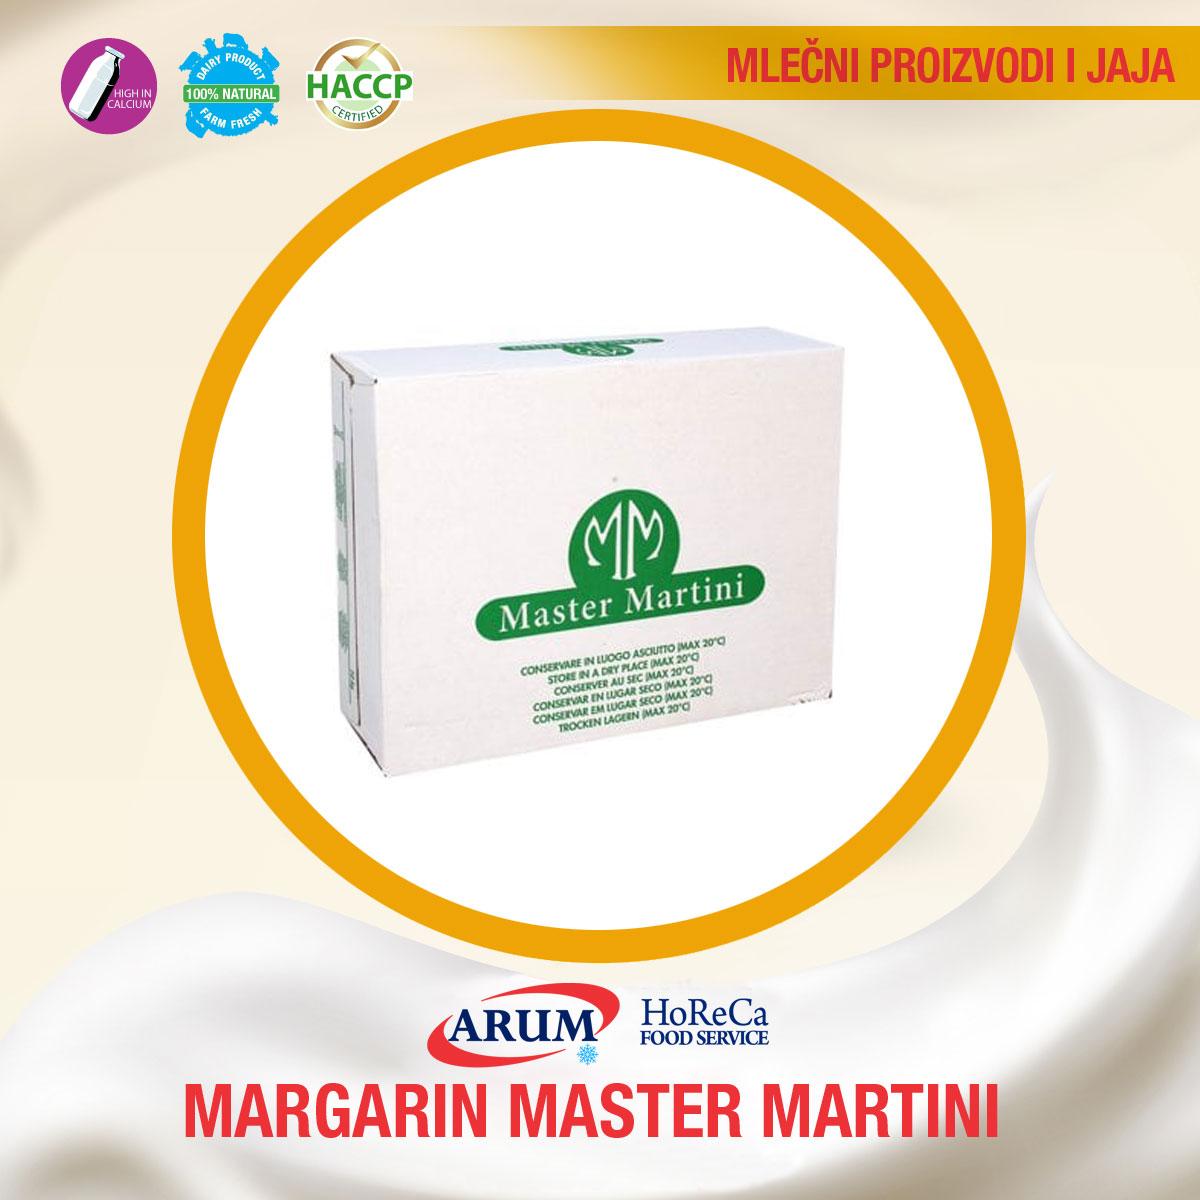 Margarin mst ekoslajs 75% (20kg/1#)